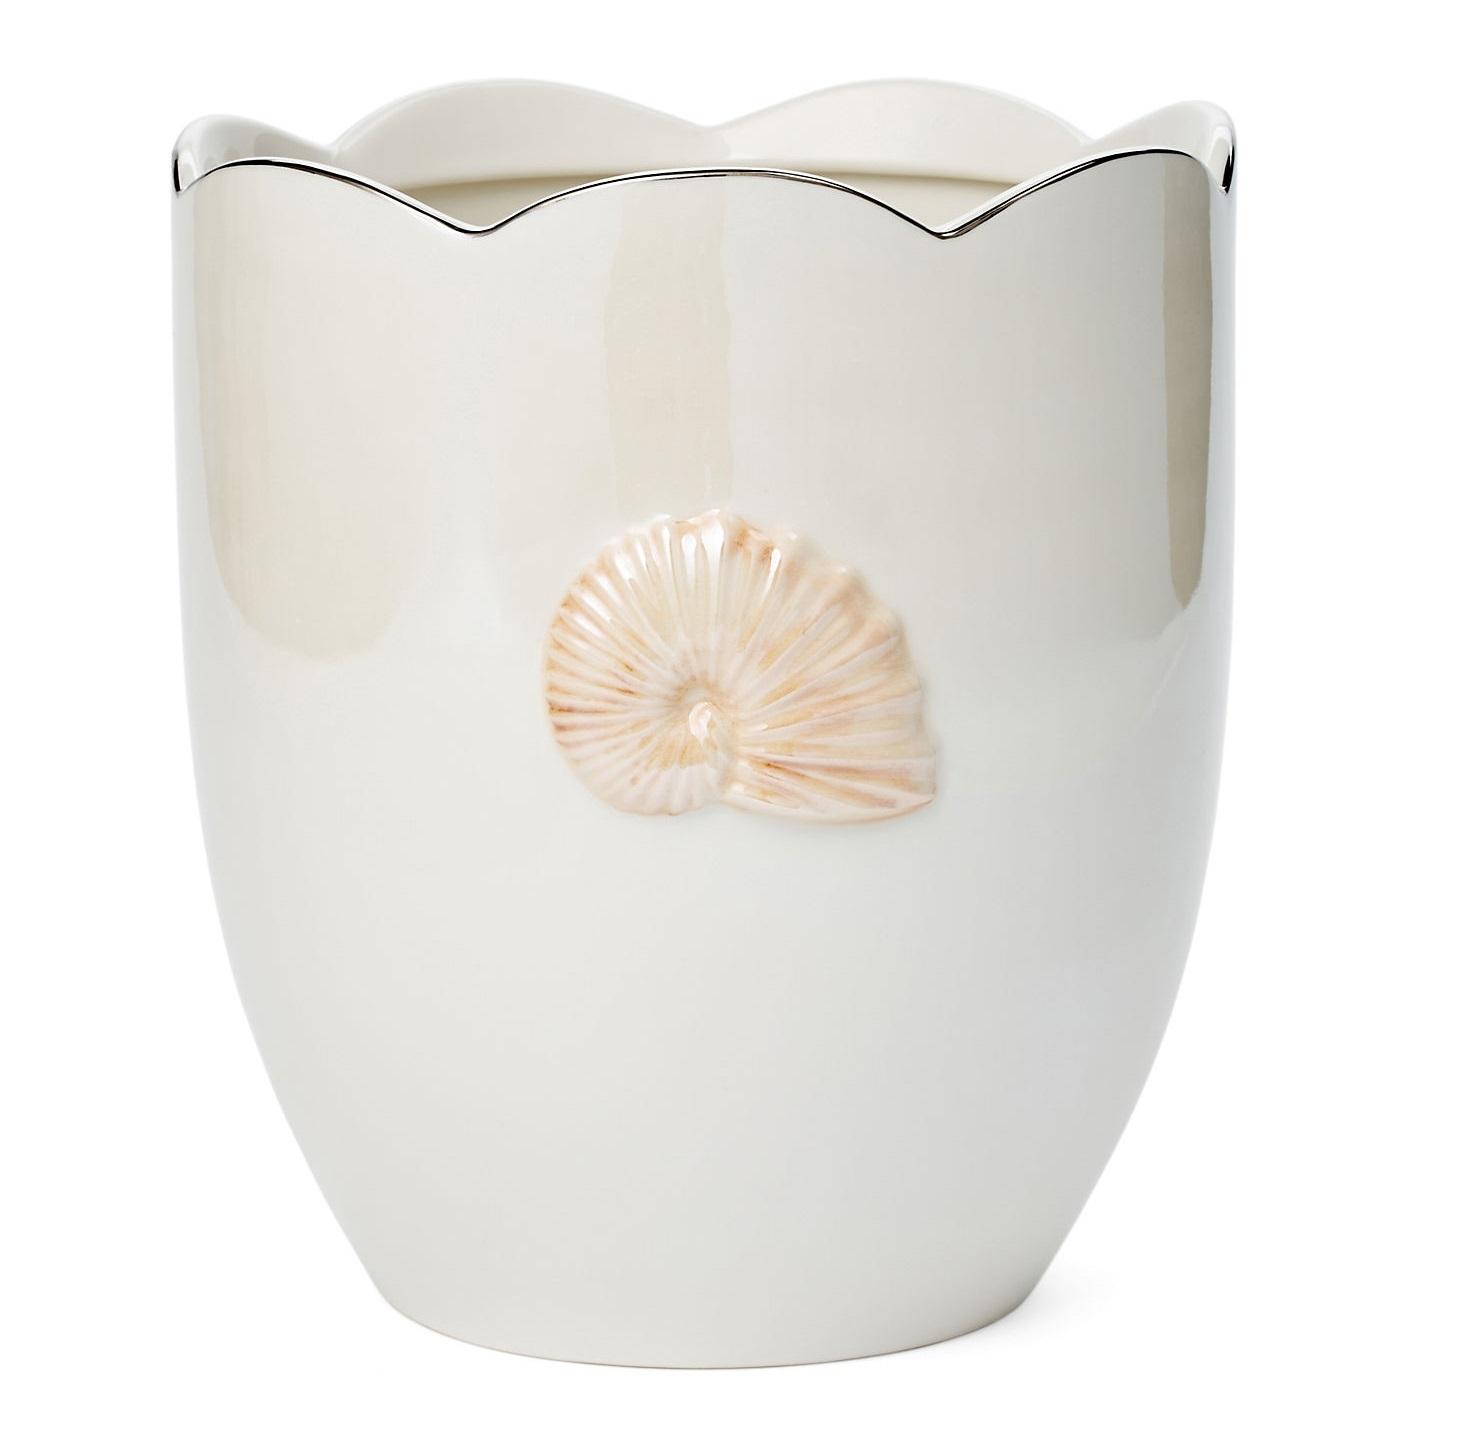 Ведра для мусора Ведро для мусора Kassatex Mare Shells Pearl vedro-dlya-musora-mare-shells-pearl-ot-kassatex-ssha-kitay.jpg